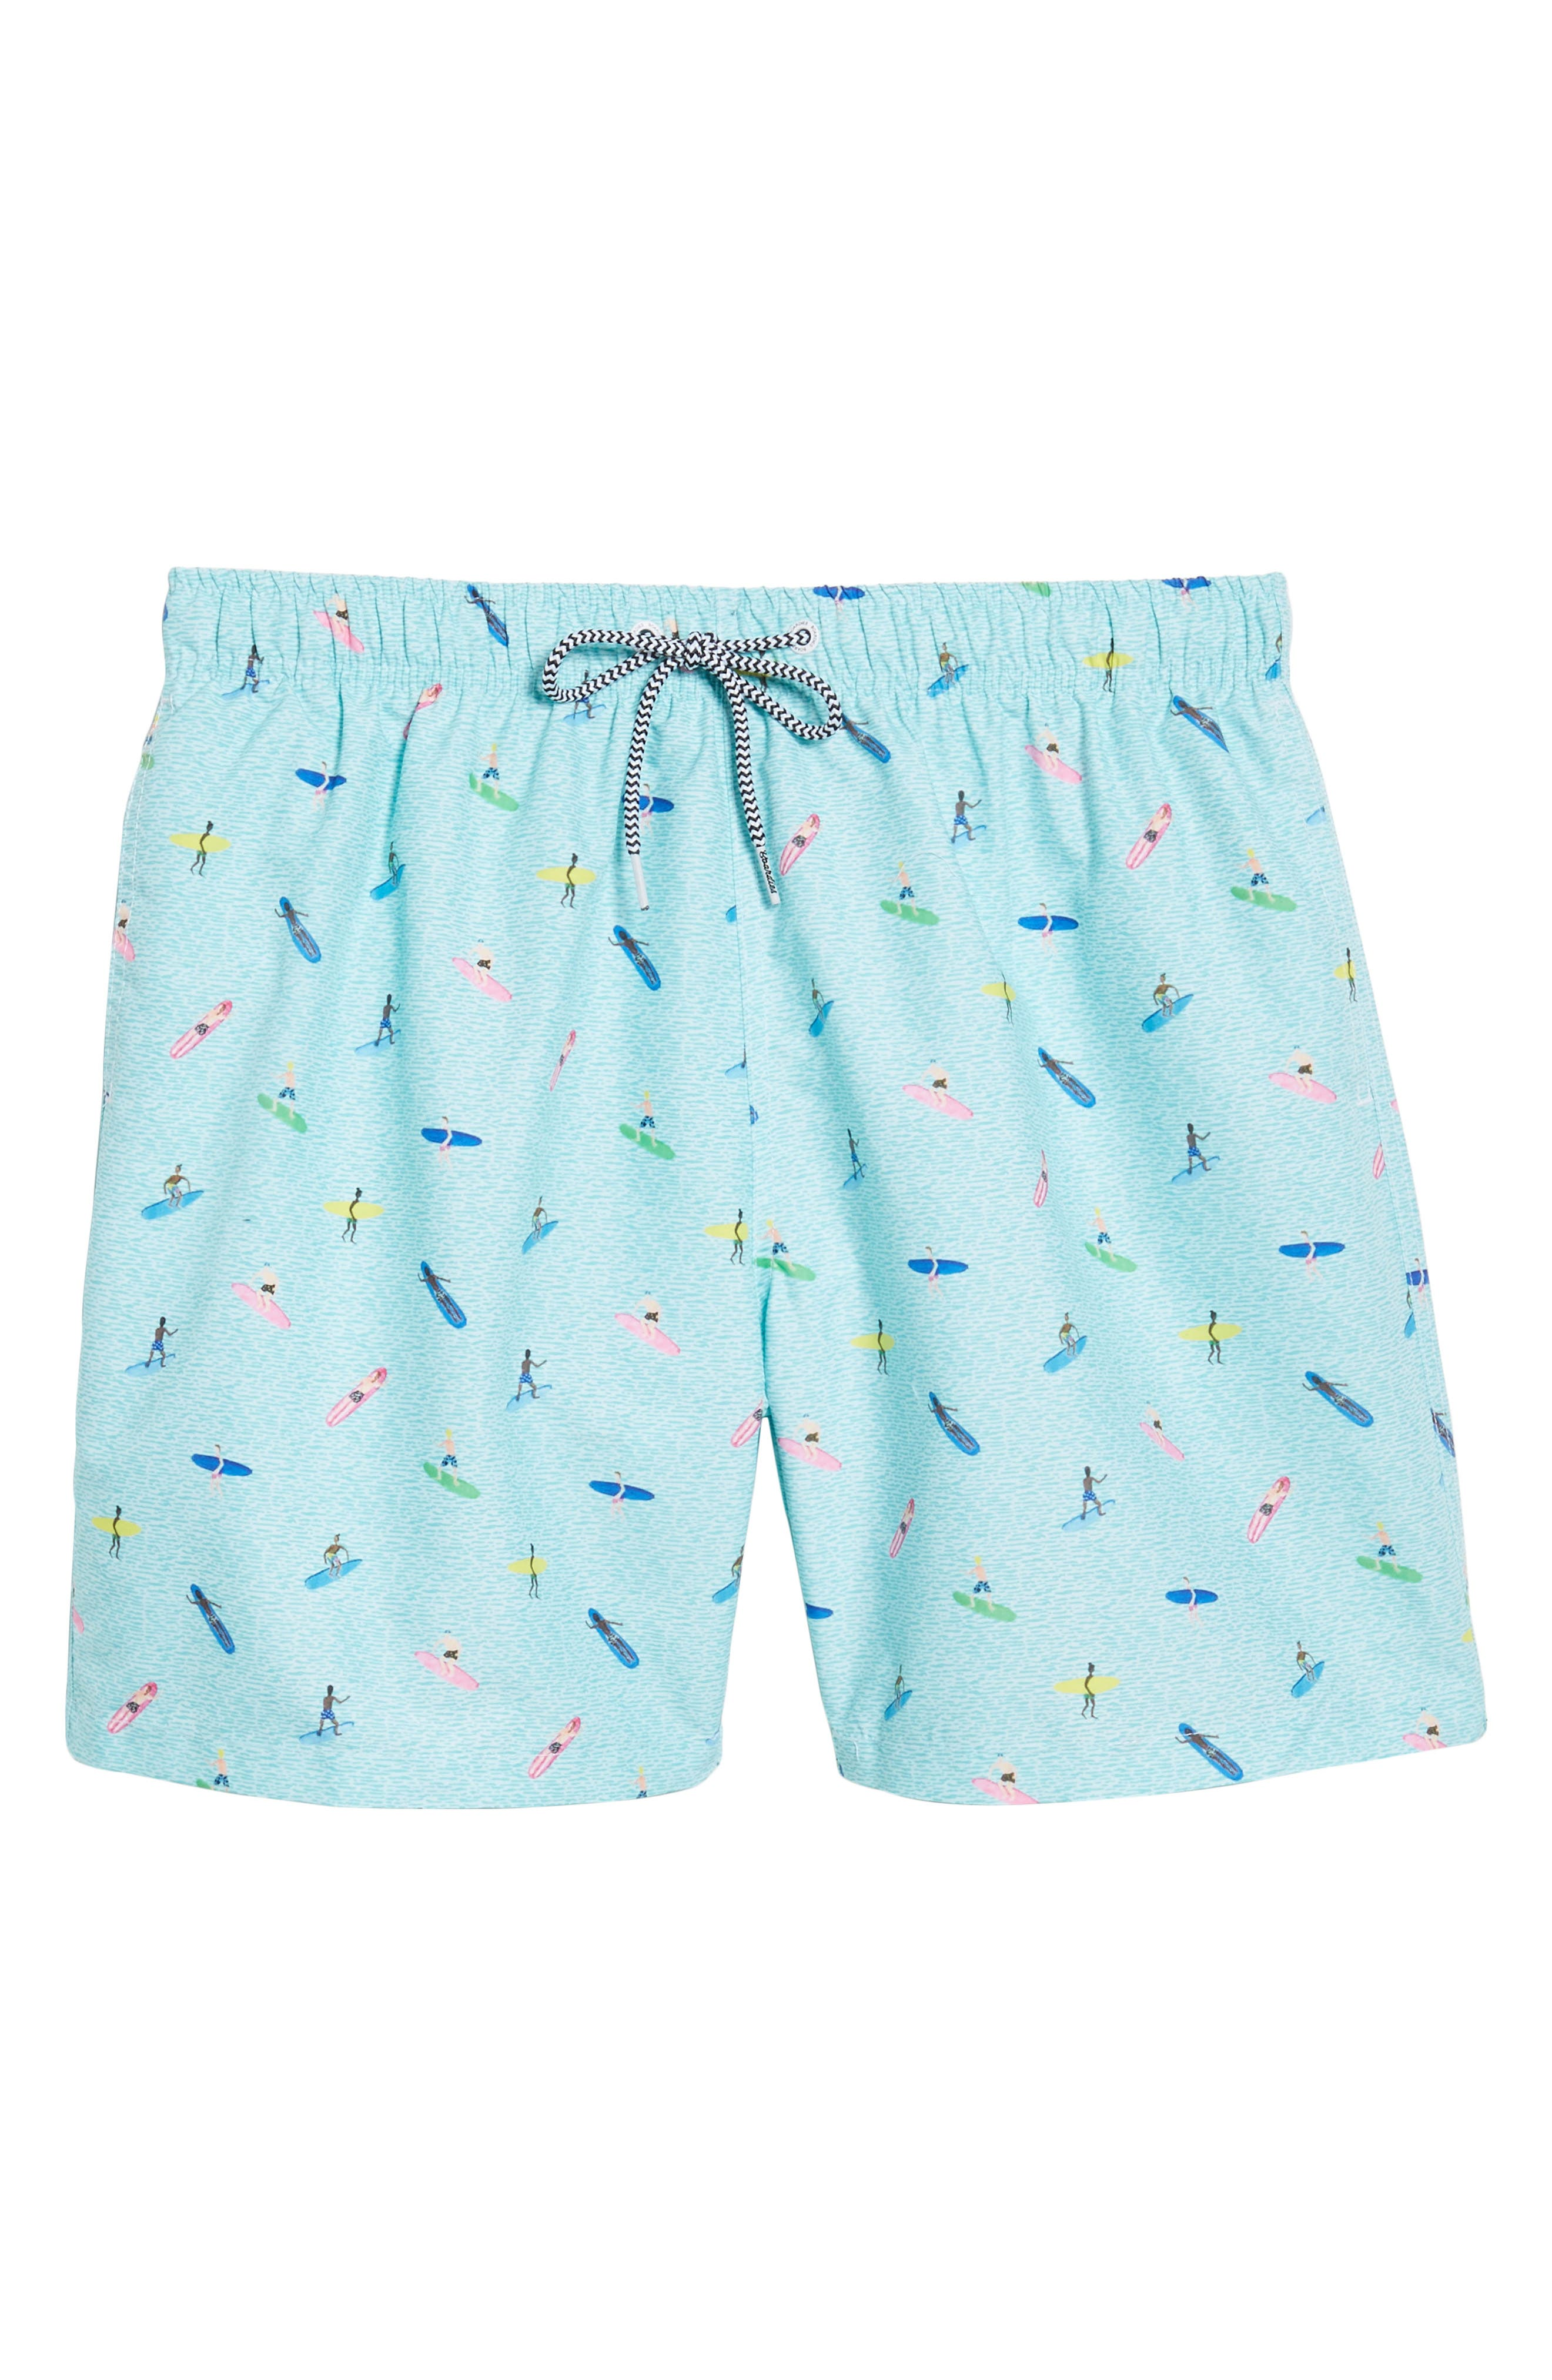 Sayulita Print Swim Shorts,                             Alternate thumbnail 6, color,                             Aqua Green